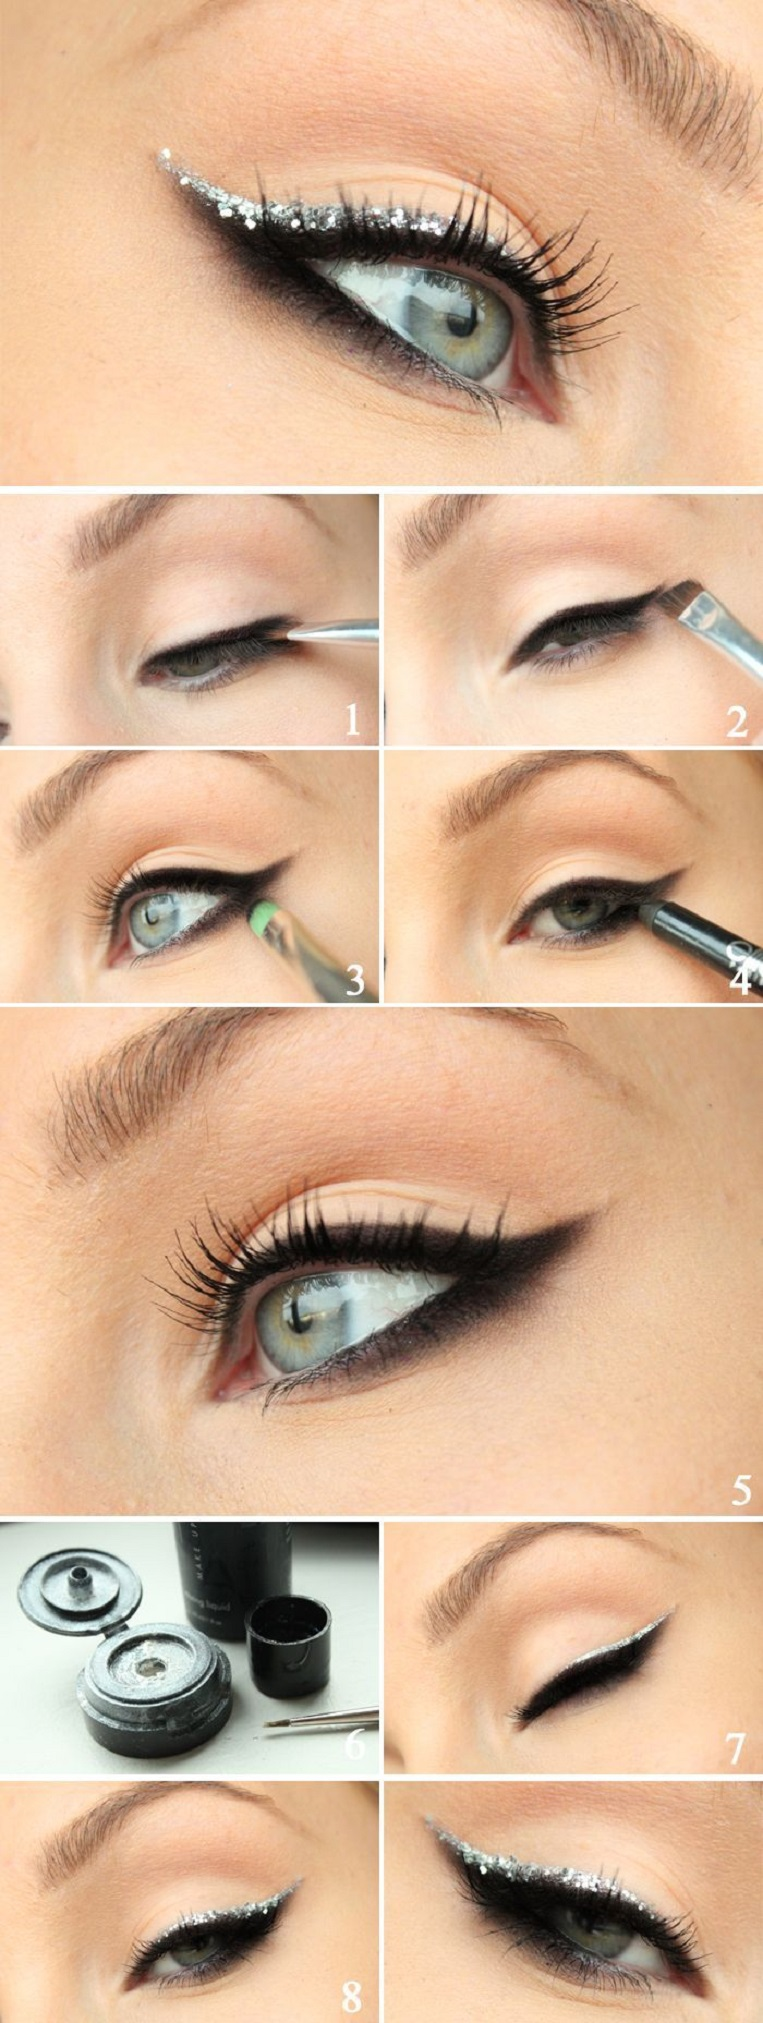 Pinterest_Smokey-eyeliner-with-silver-glitter